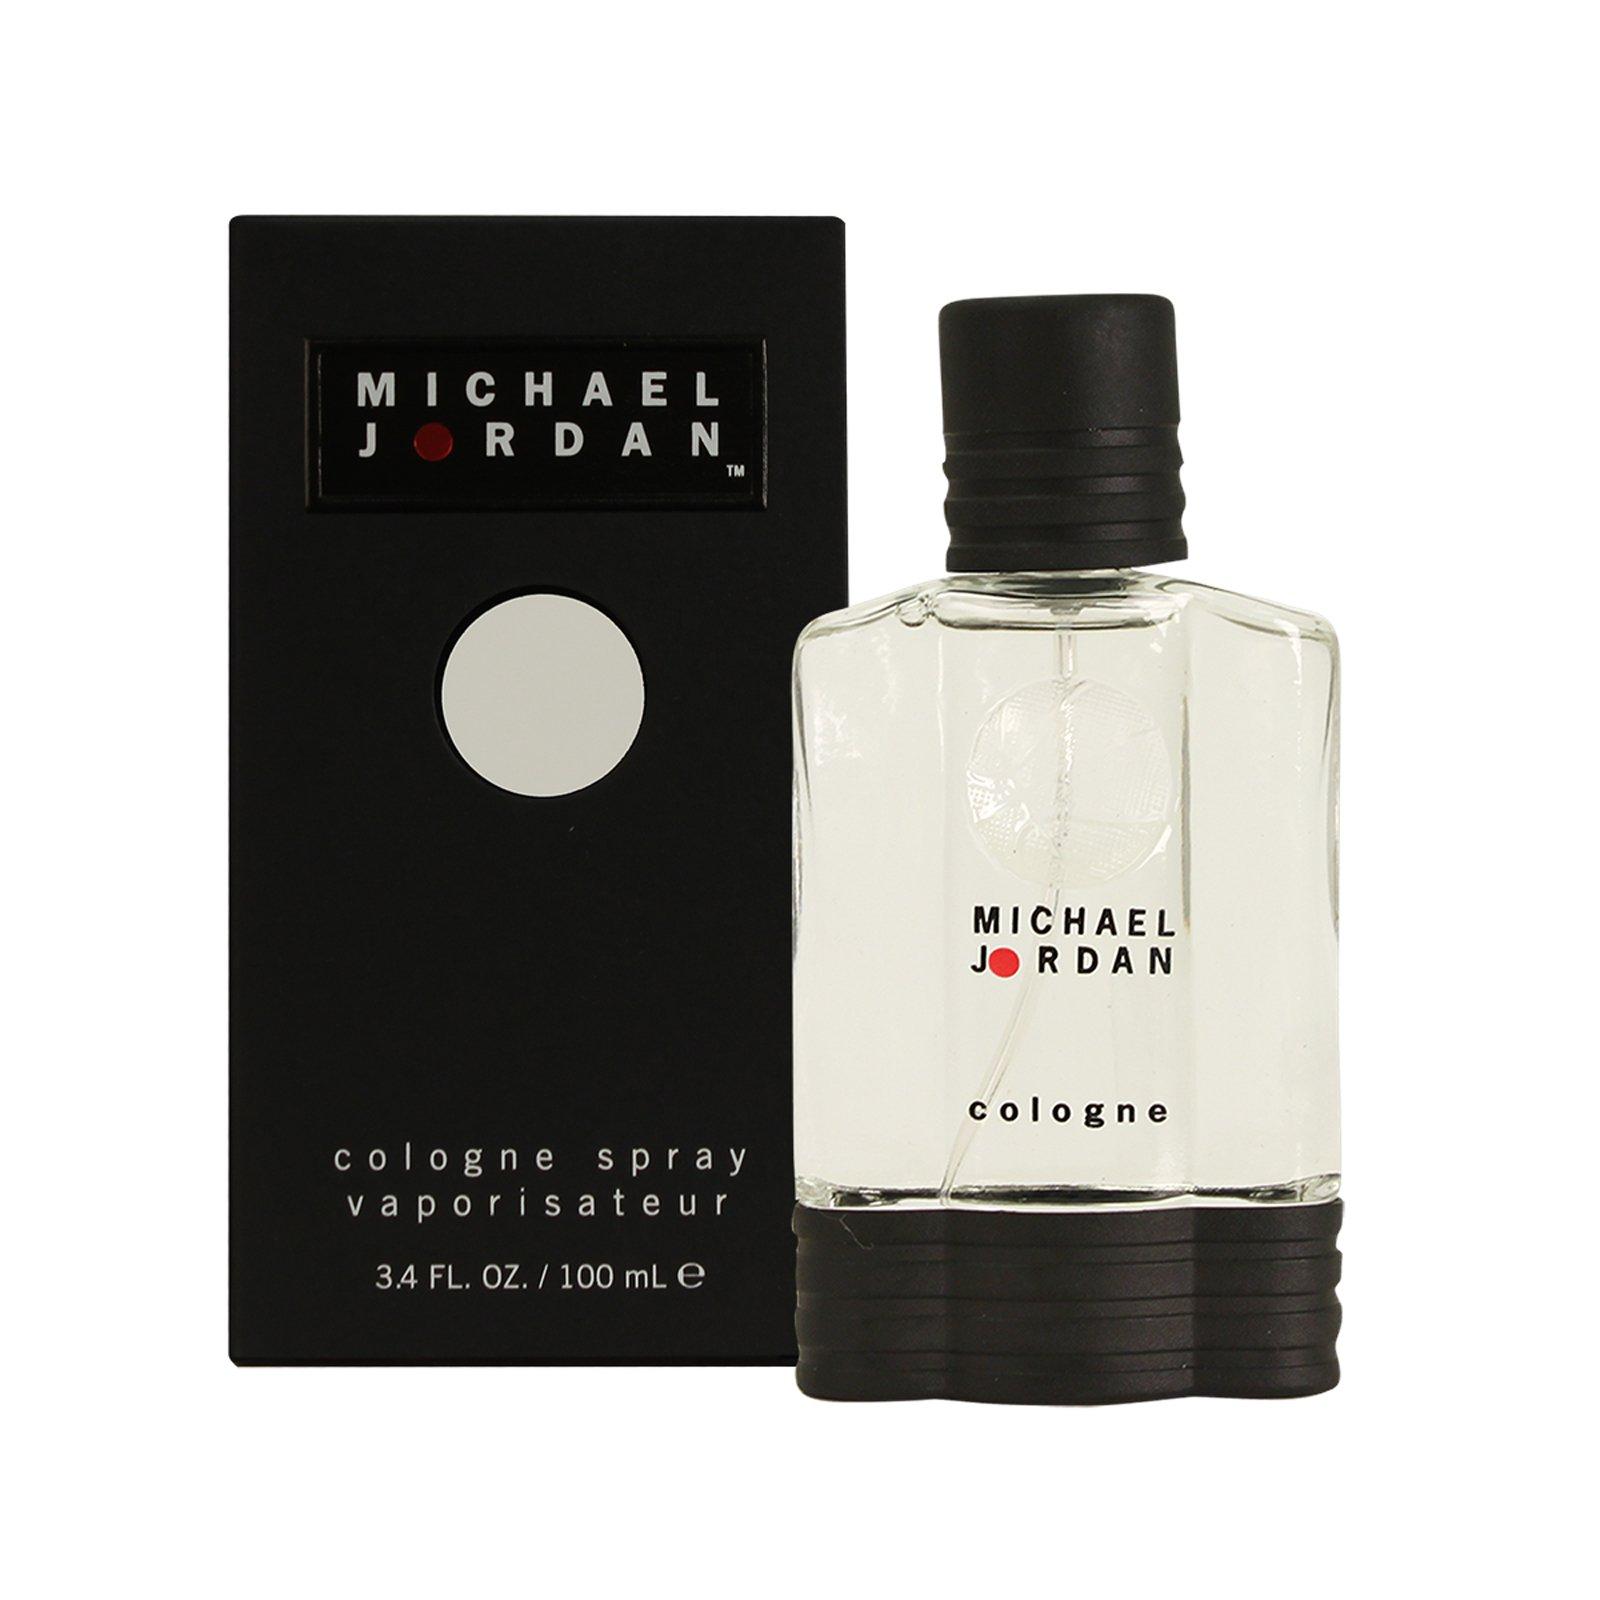 Michael Jordan By Michael Jordan for Men, 3.4 Ounce by Michael Jordan